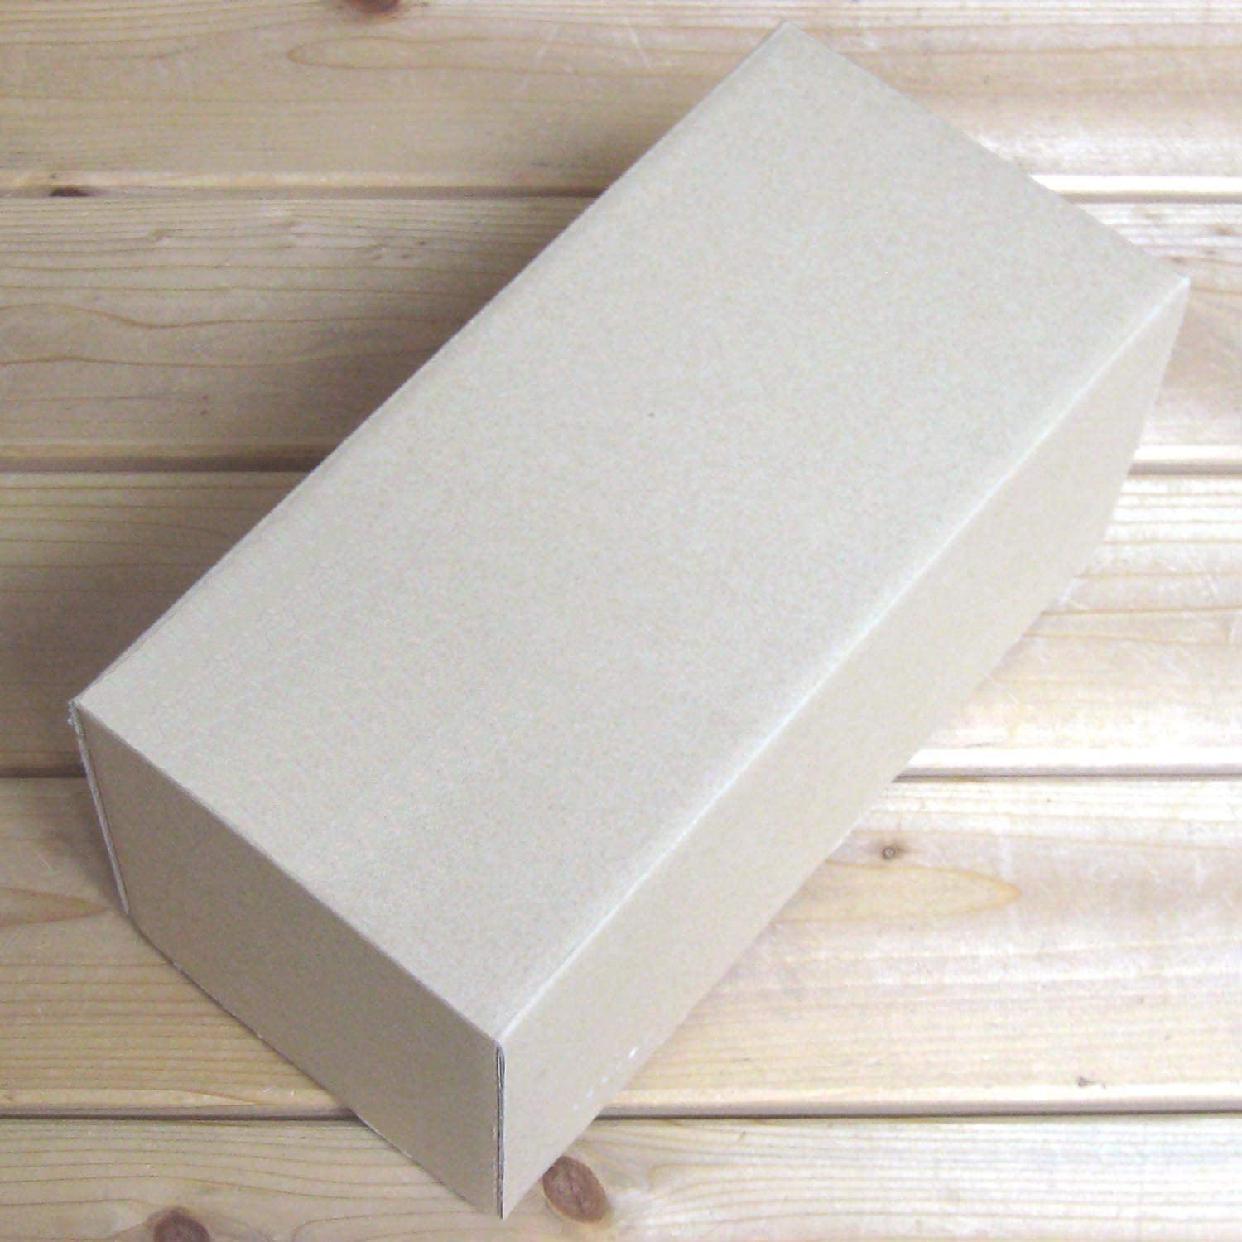 Nagao(ナガオ) 燕三条 鰹節削り器 鰹箱 SEN(栓)の商品画像7